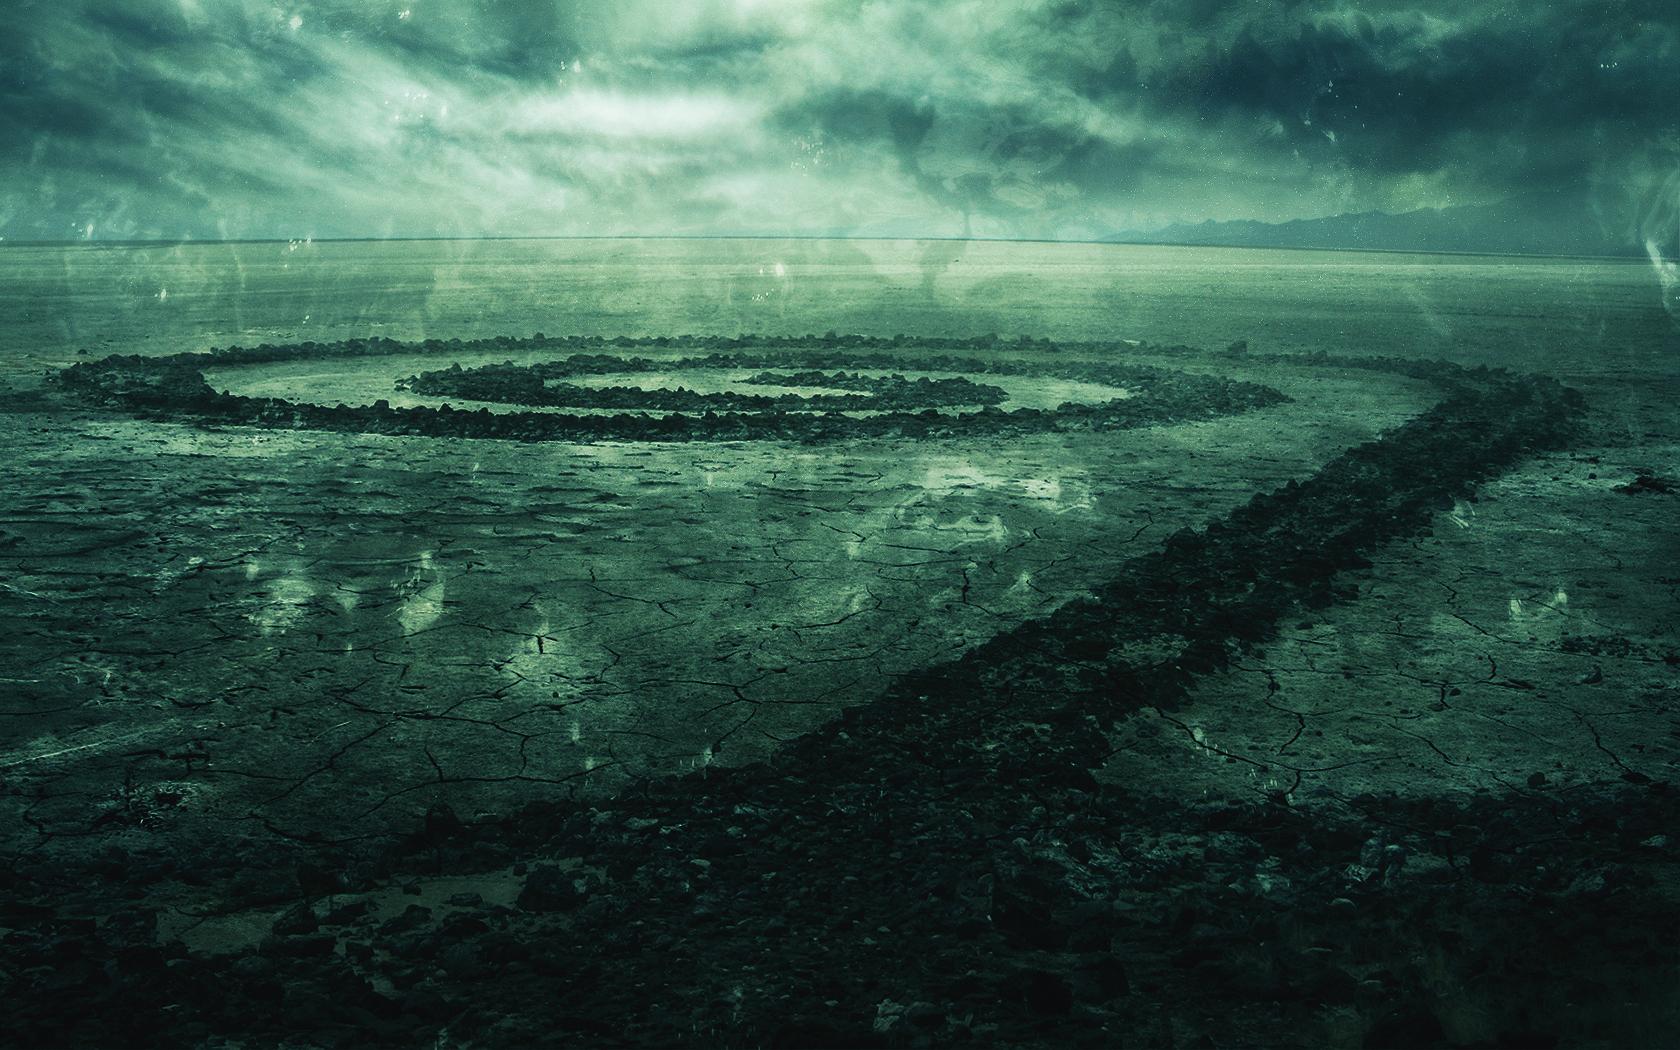 Martian Landscape 2 by SxyfrG